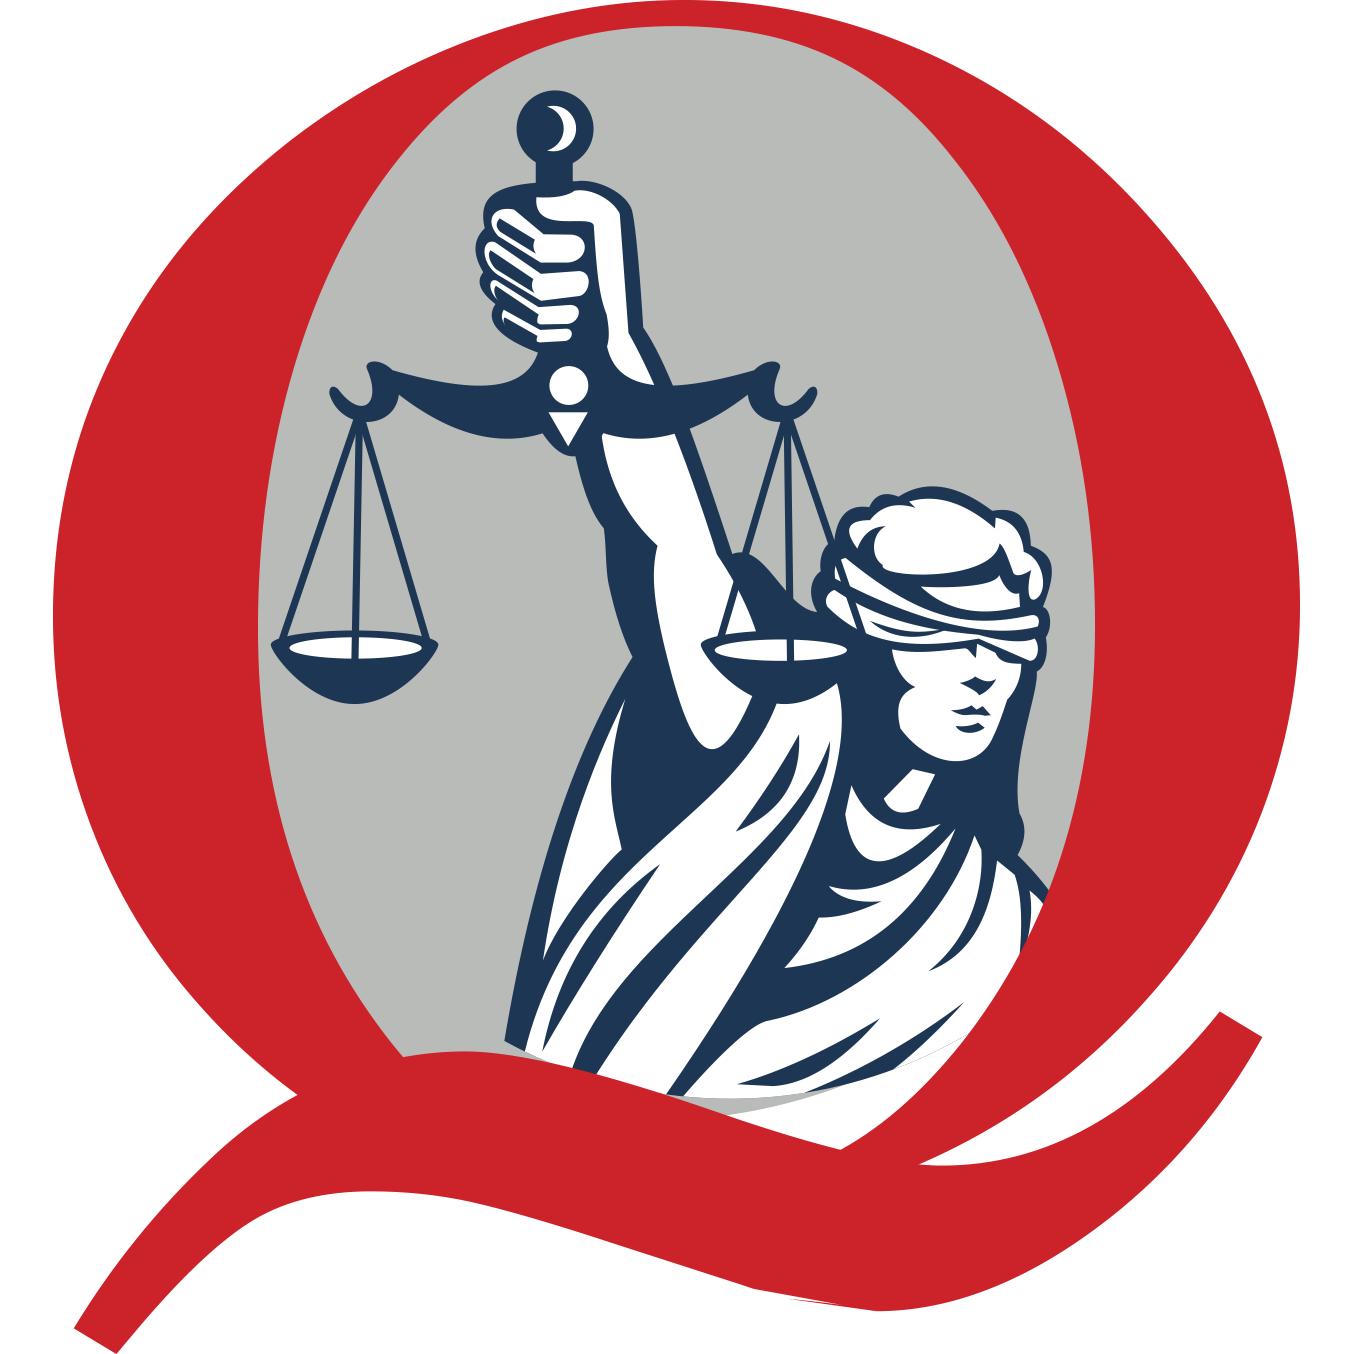 Albert Quirantes, Esq. Criminal DUI & Ticket Law Center